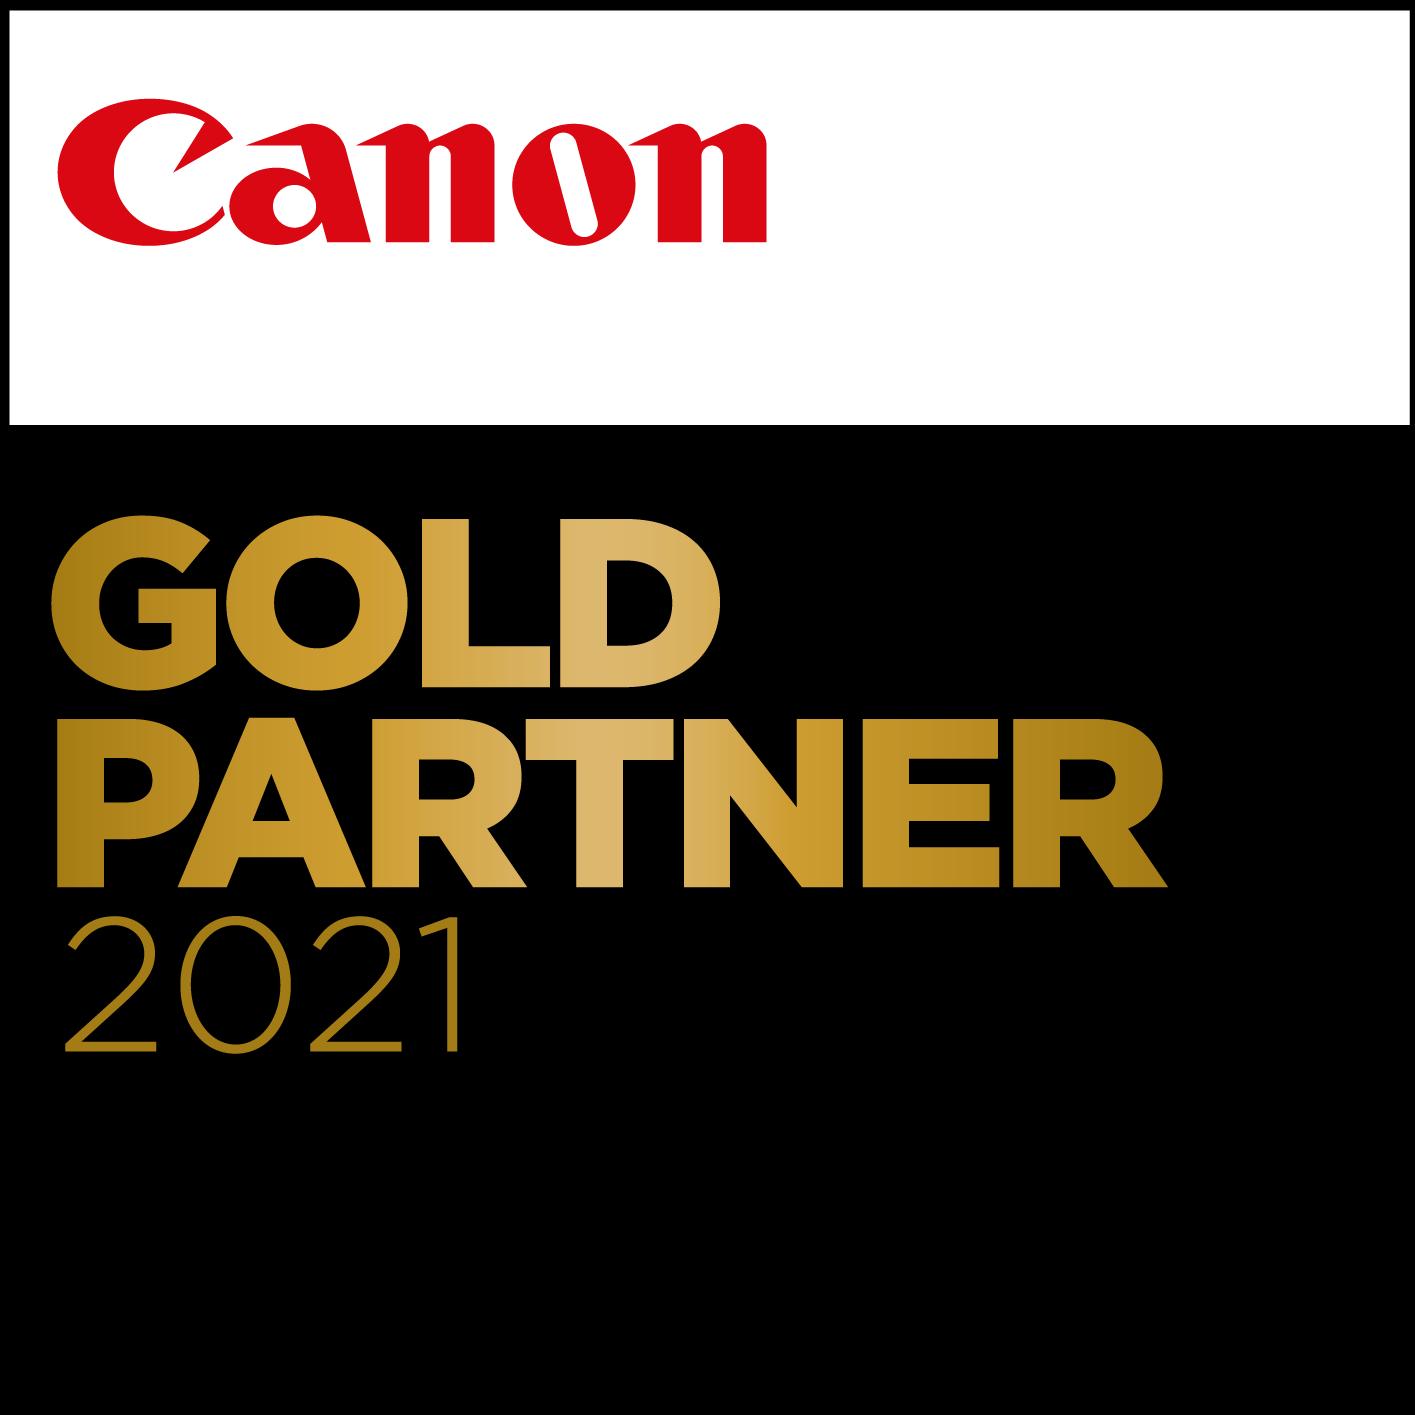 Canon Gold Partner 2021 logo